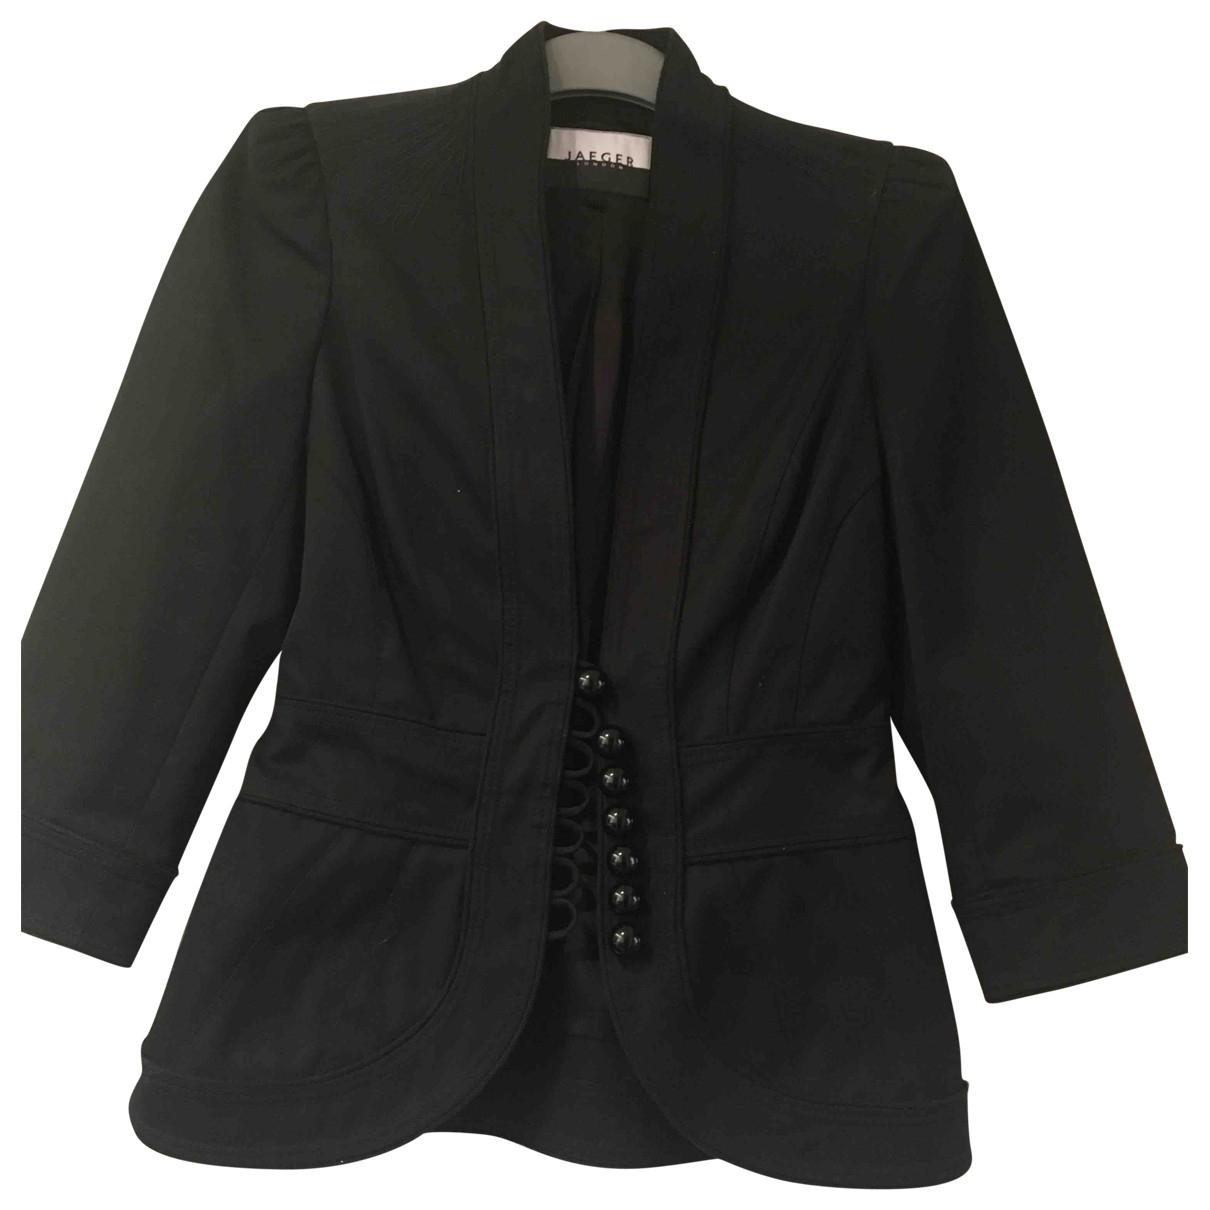 Jaeger London \N Black Cotton jacket for Women 10 UK